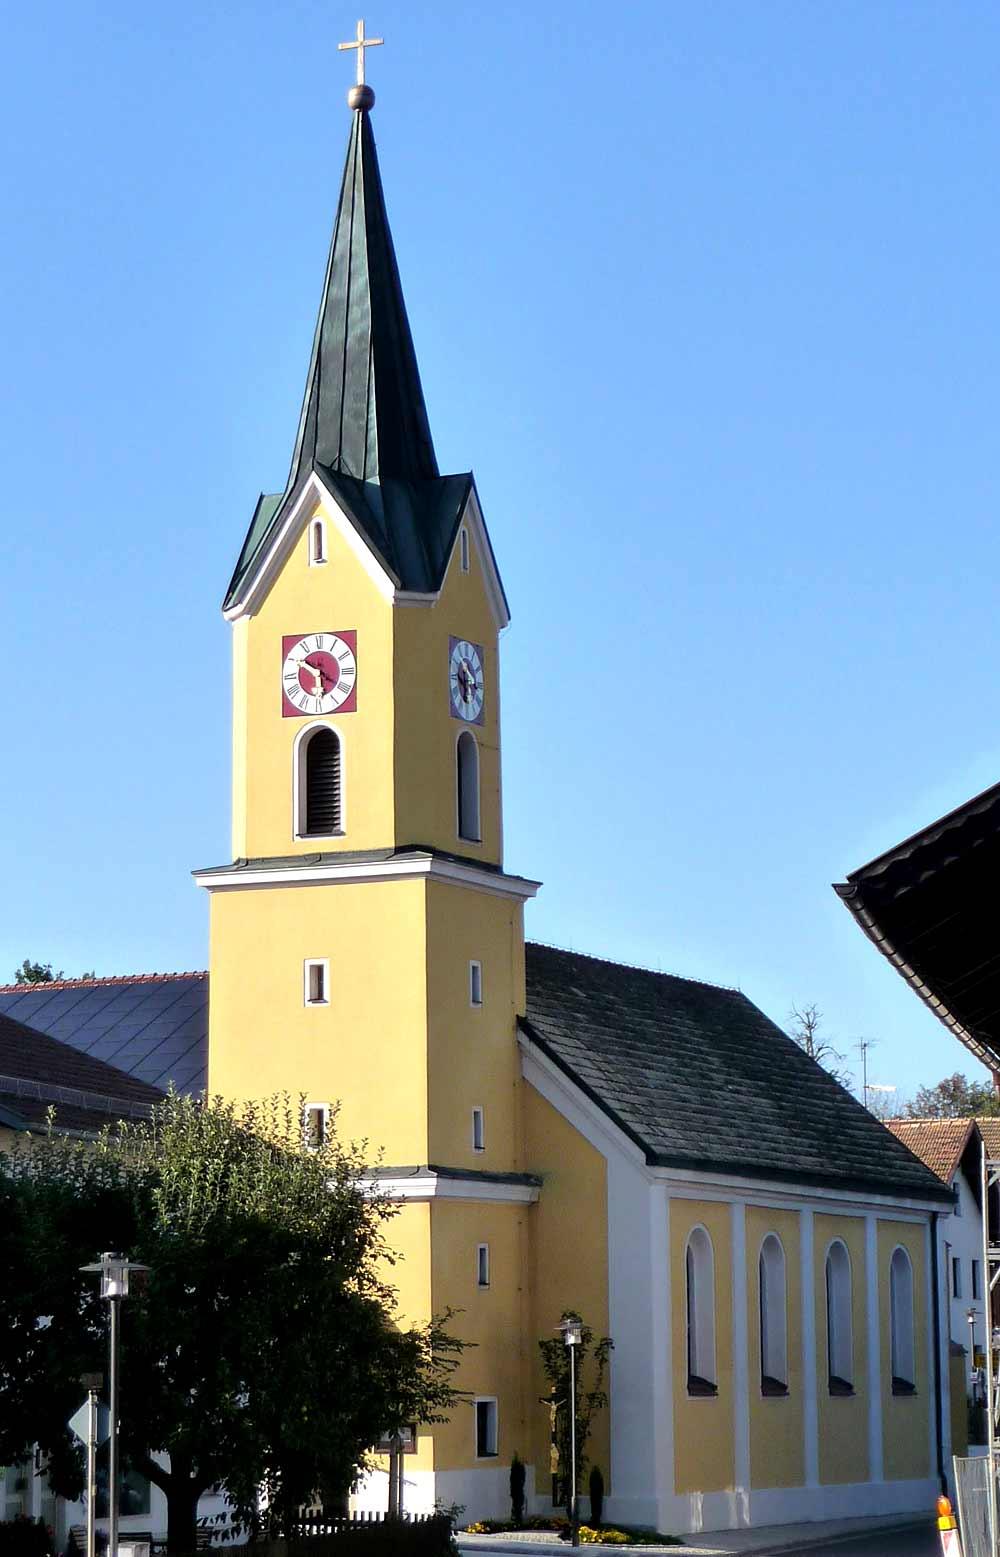 Blick auf den Kirchturm der Pfarrkirche Mariä Verkündigung in Zandt